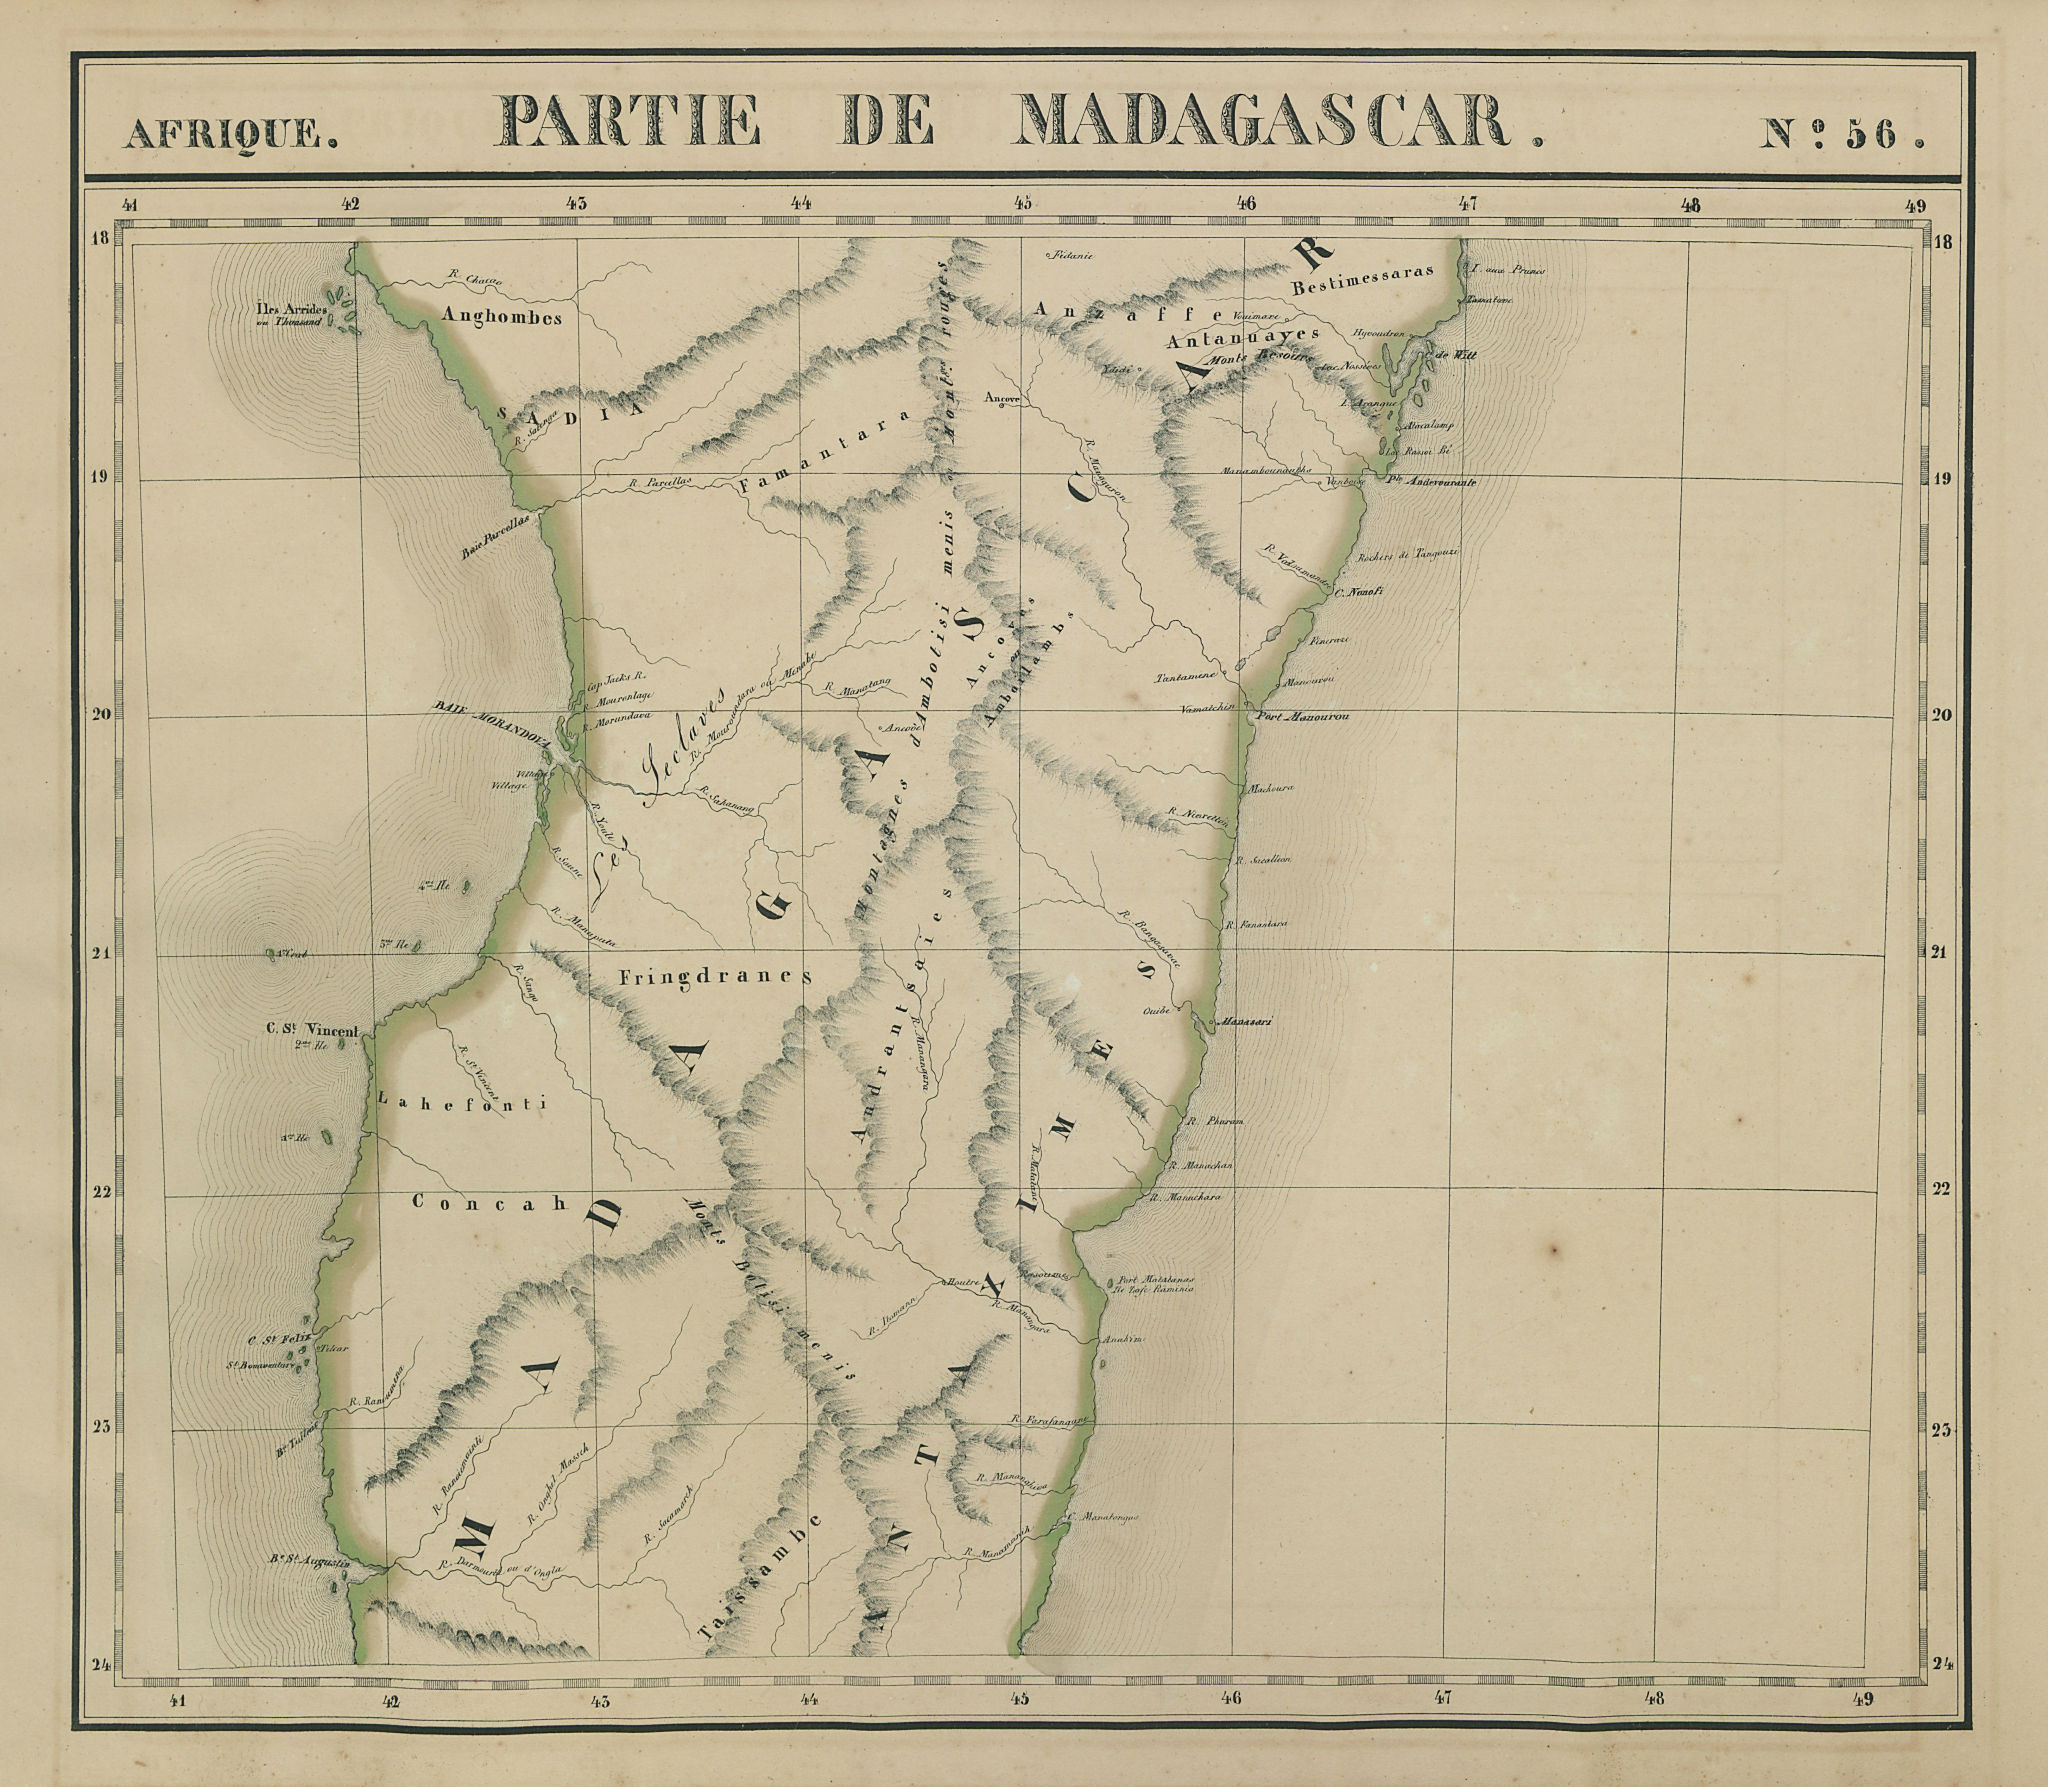 Afrique. Partie de Madagascar #56. Central Madagascar. VANDERMAELEN 1827 map